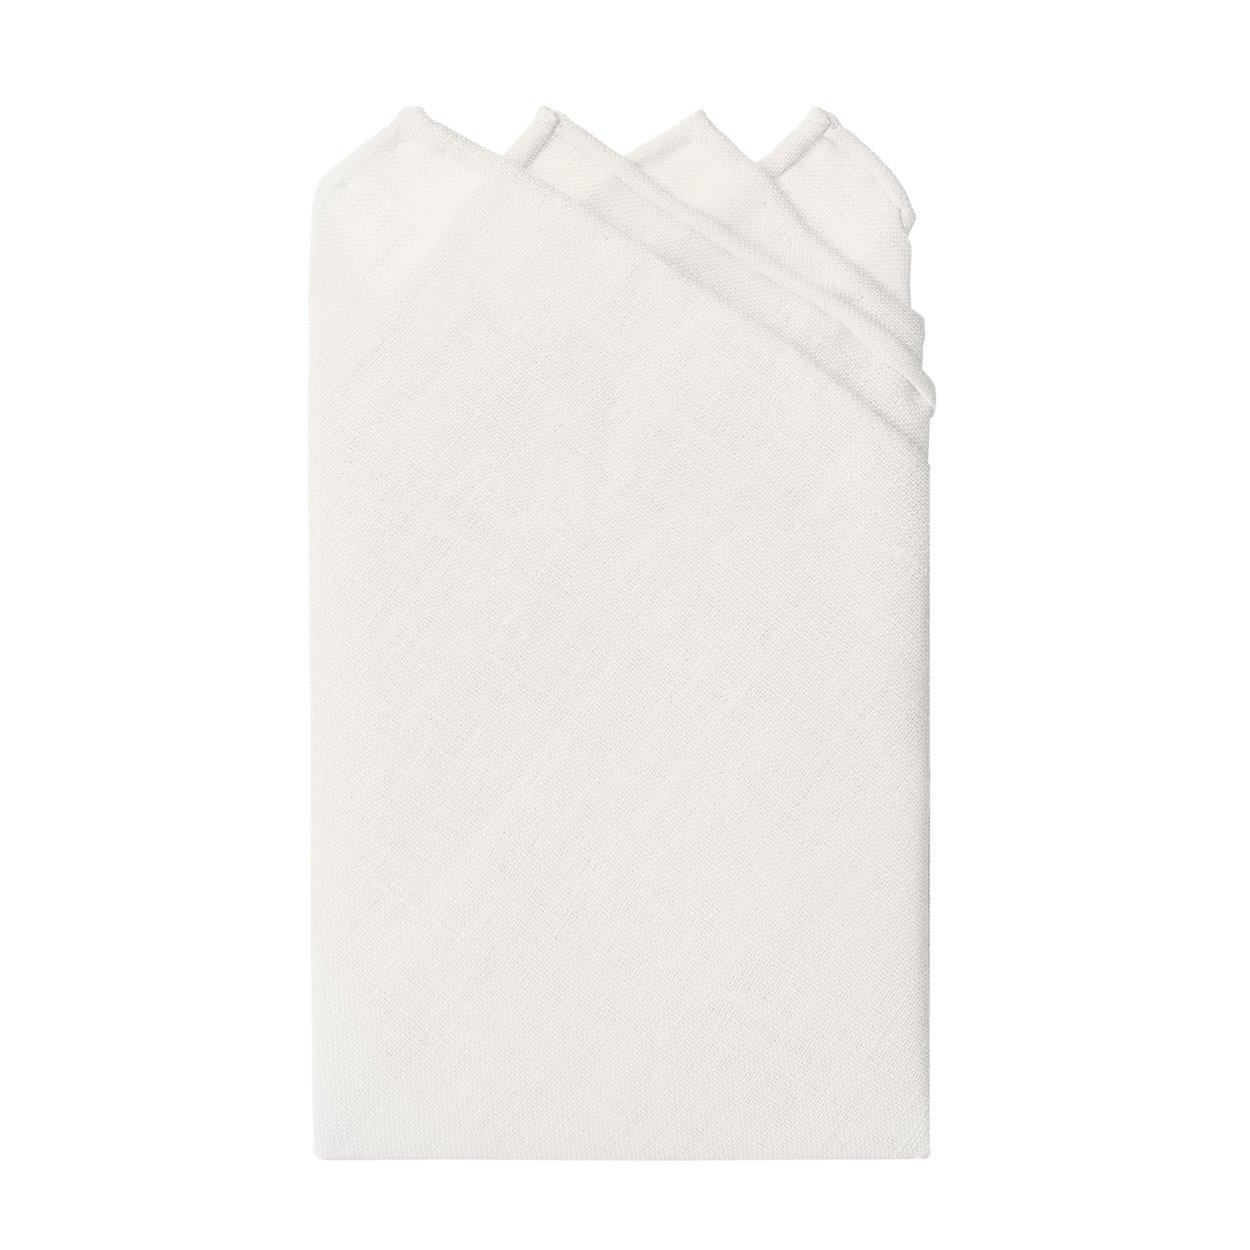 Jacob Alexander Linen Handrolled 15'' x 15'' Pocket Square Hanky - White